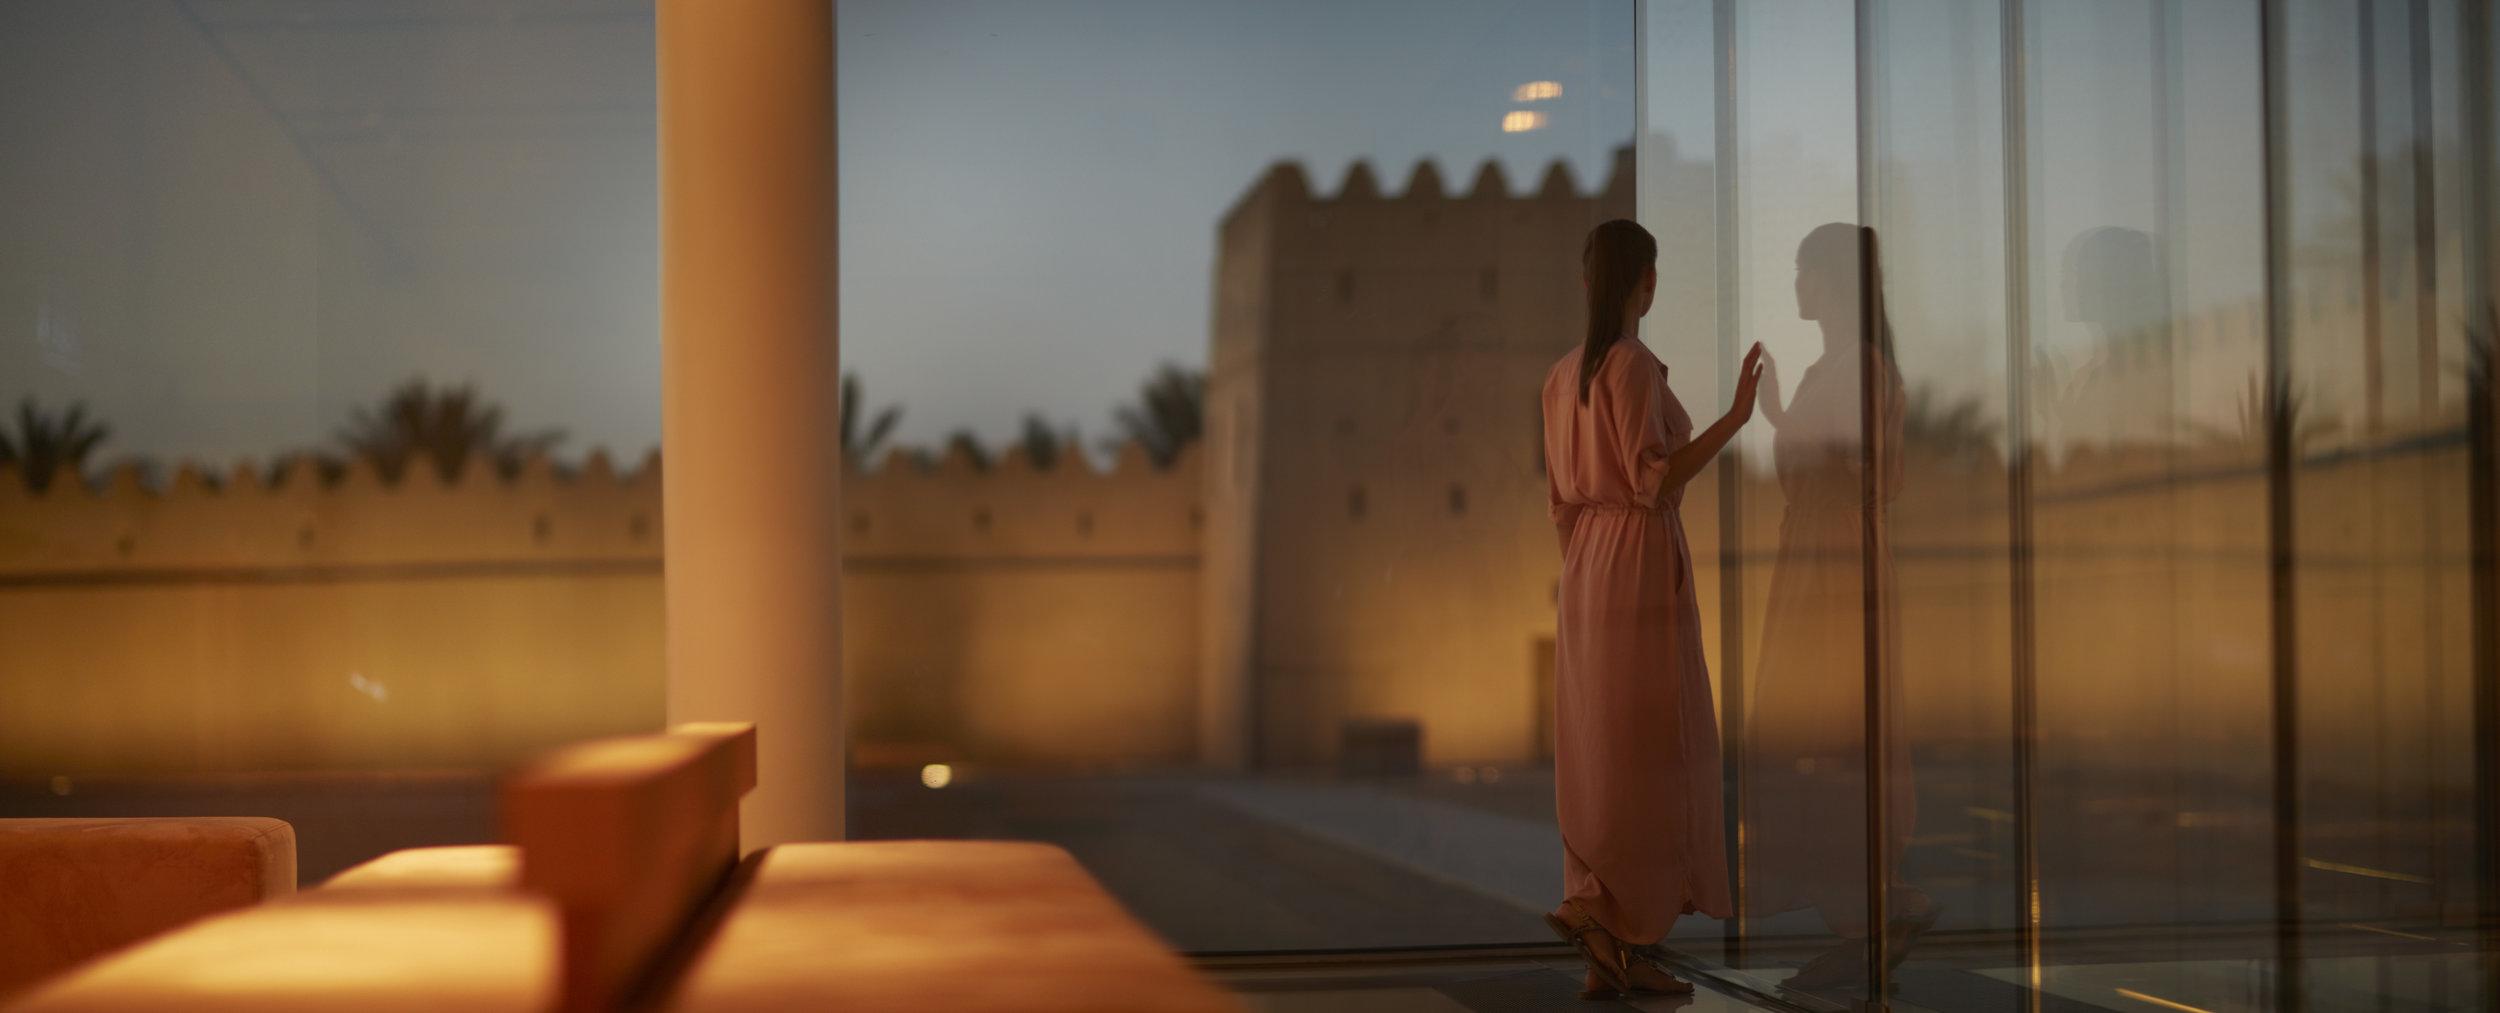 Abu_Dhabi_Qasr_Al_Muwaji_Fort_S5-0056_comp.jpeg